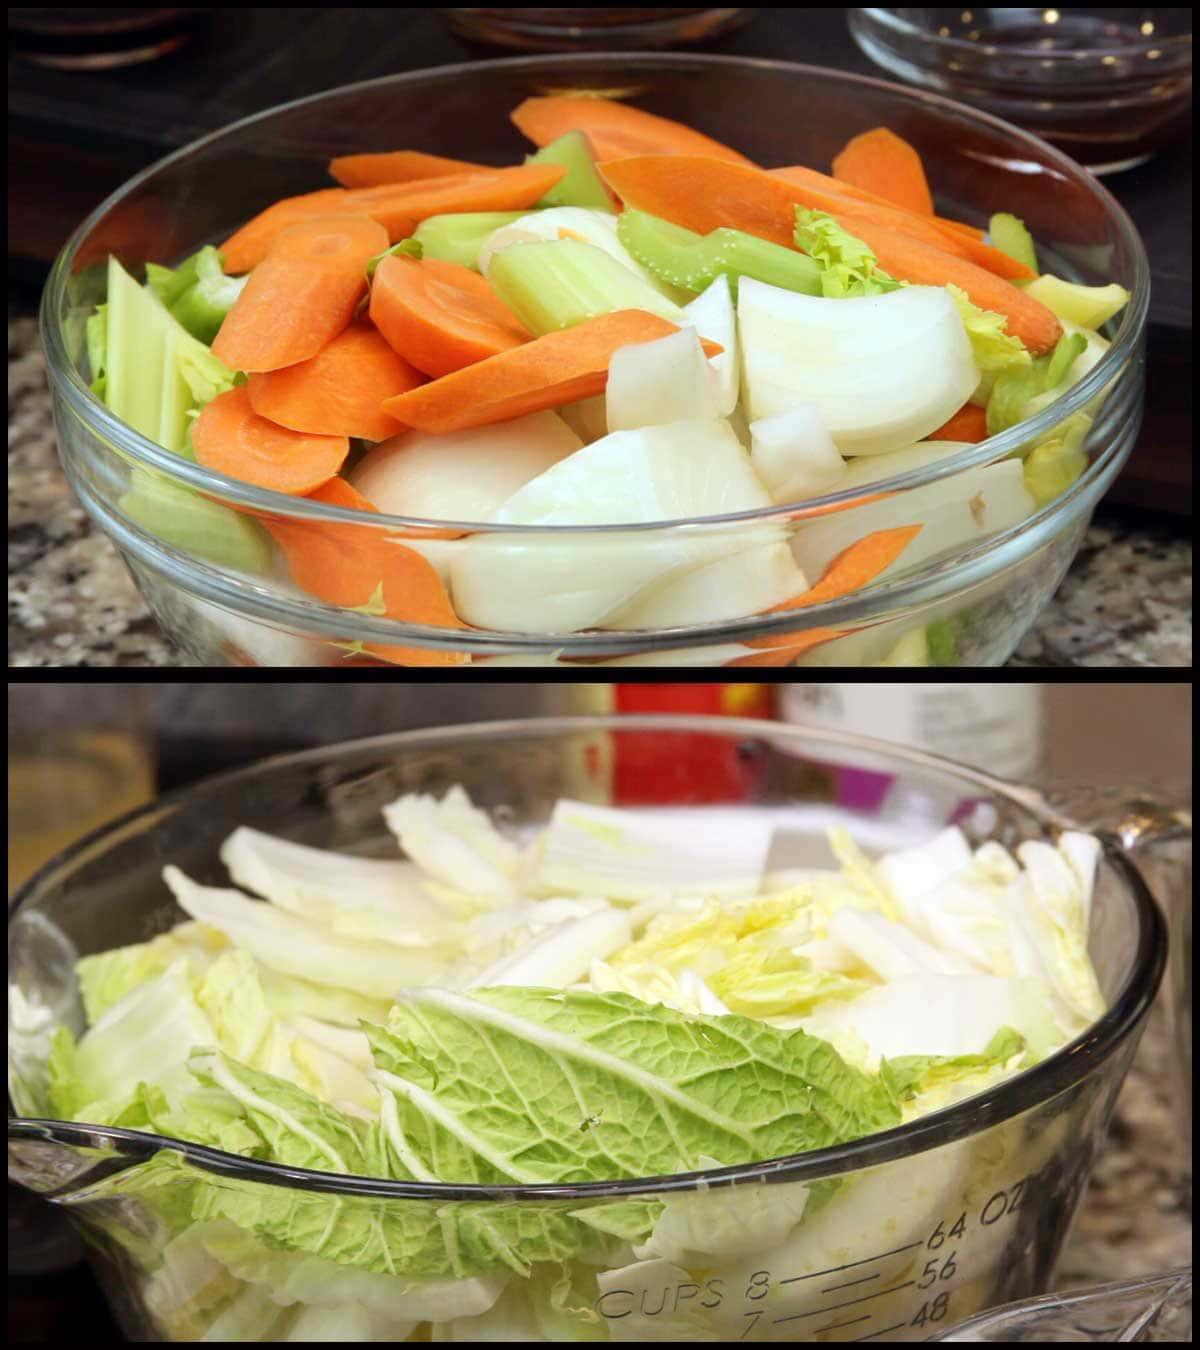 bowls of cut up vegetables